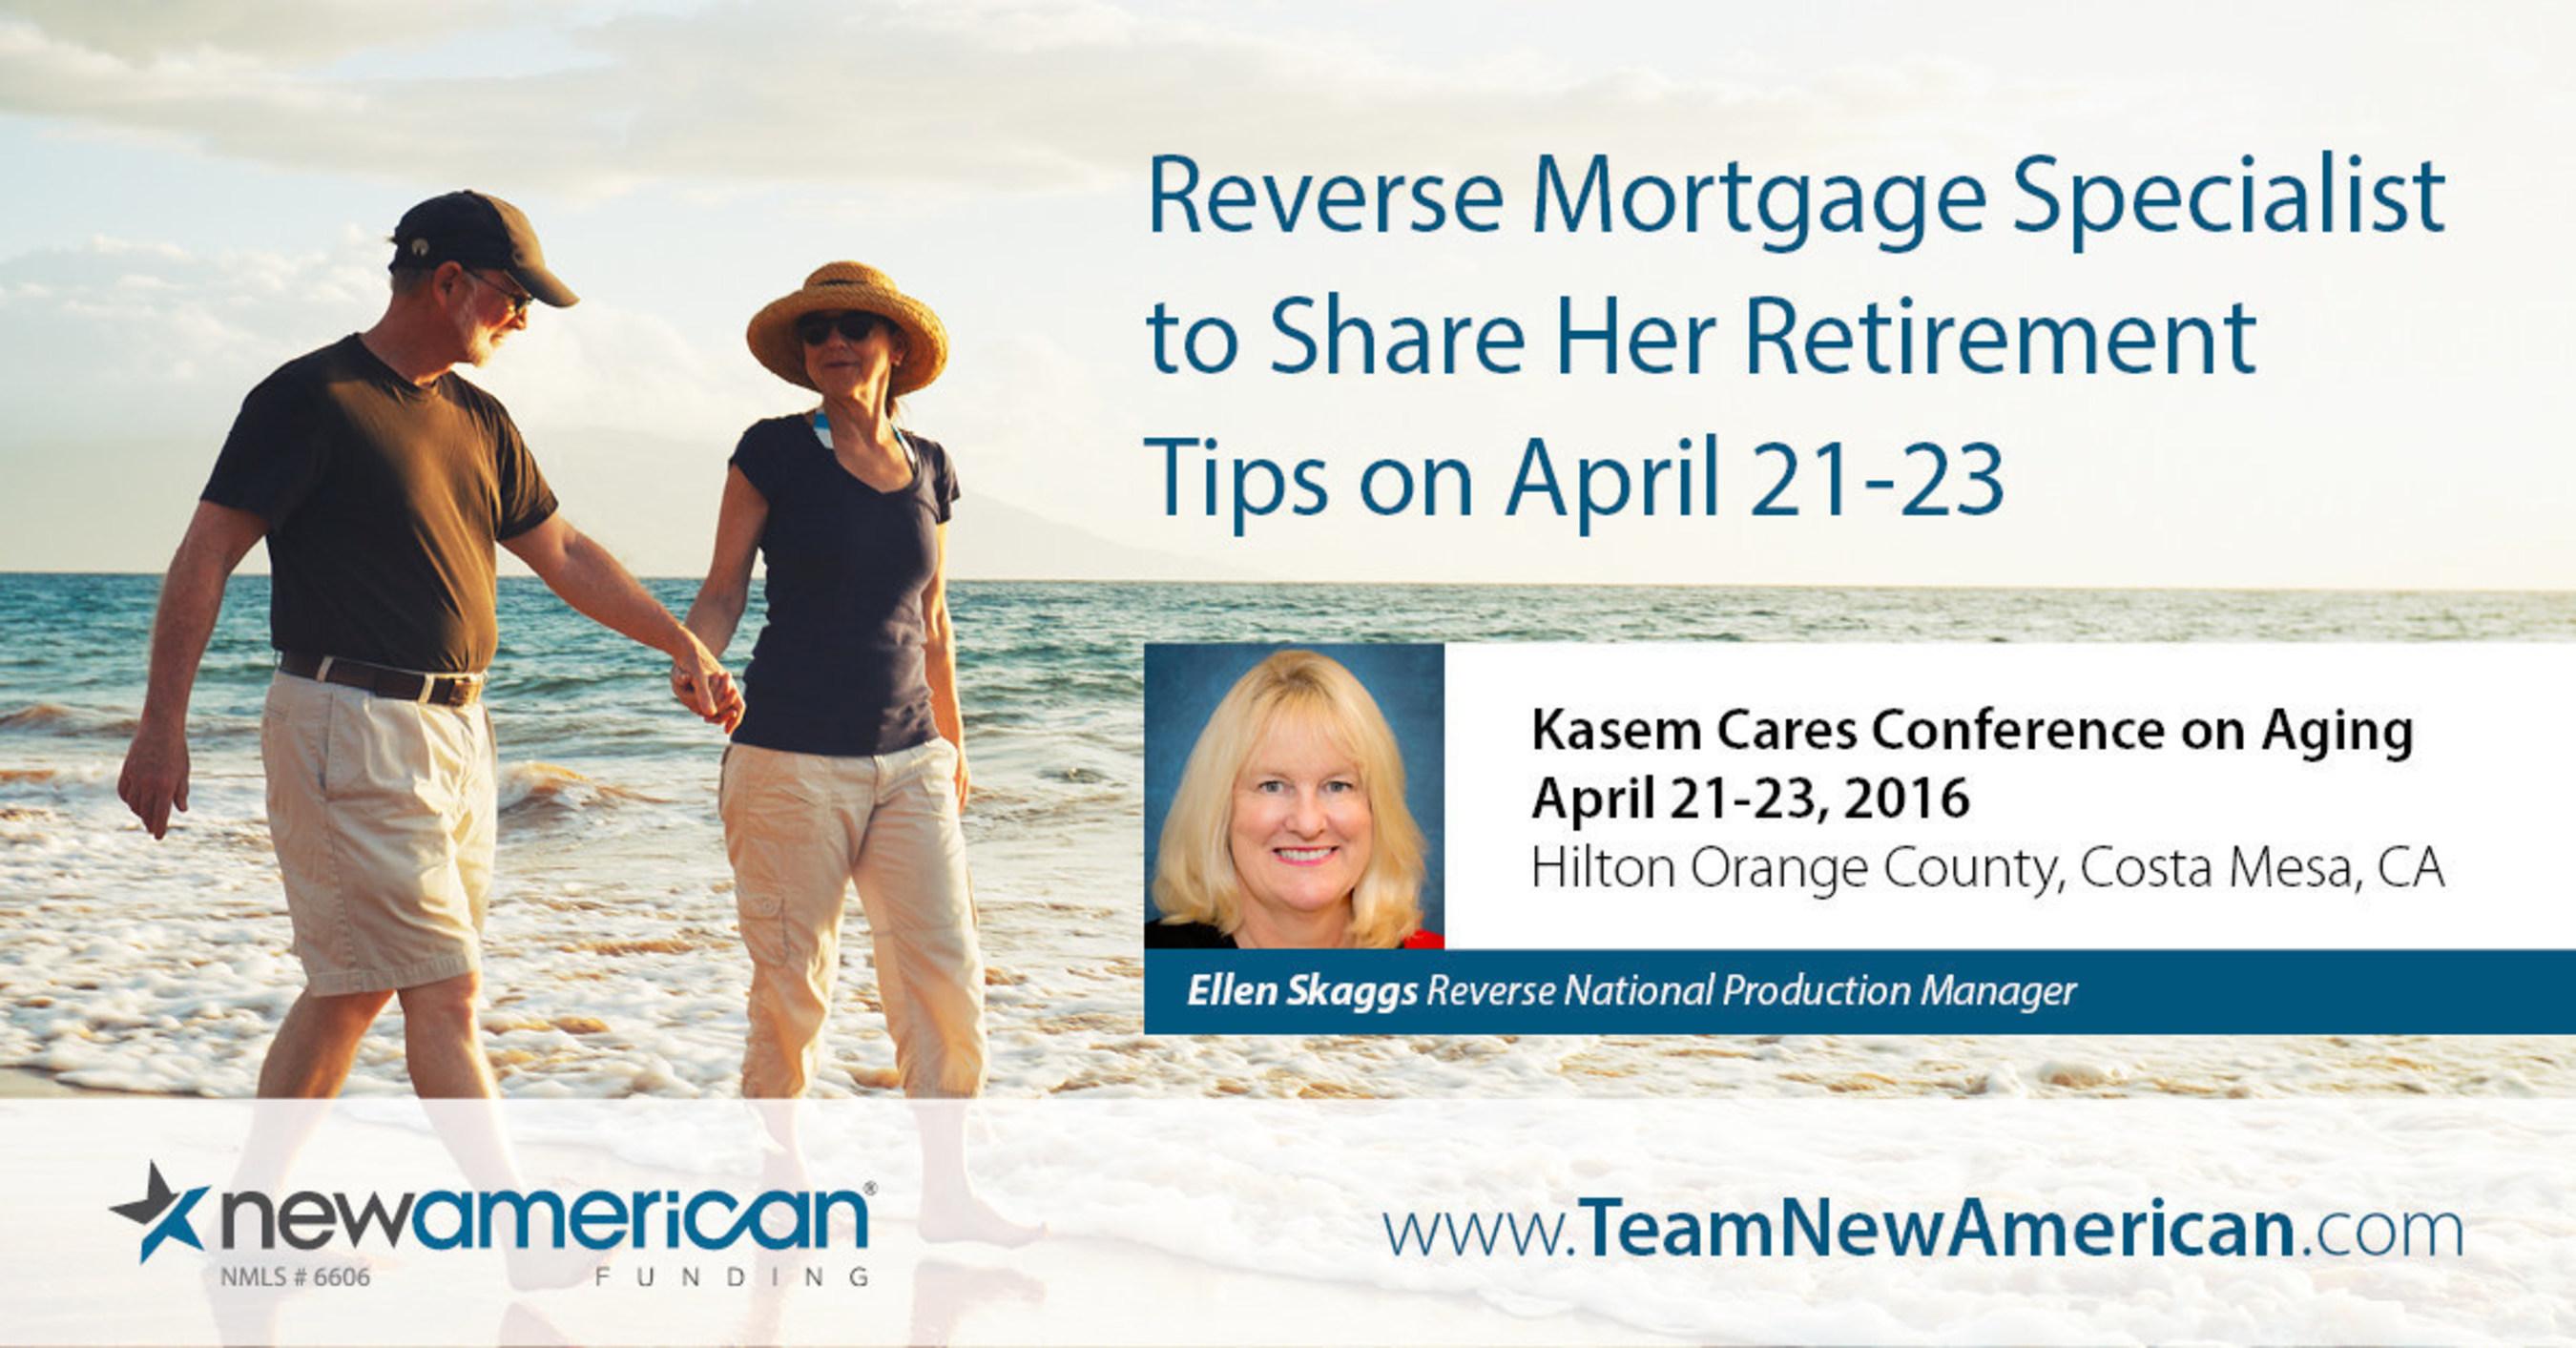 New American Funding's Ellen Skaggs to Speak at Kasem Cares Conference on Aging.